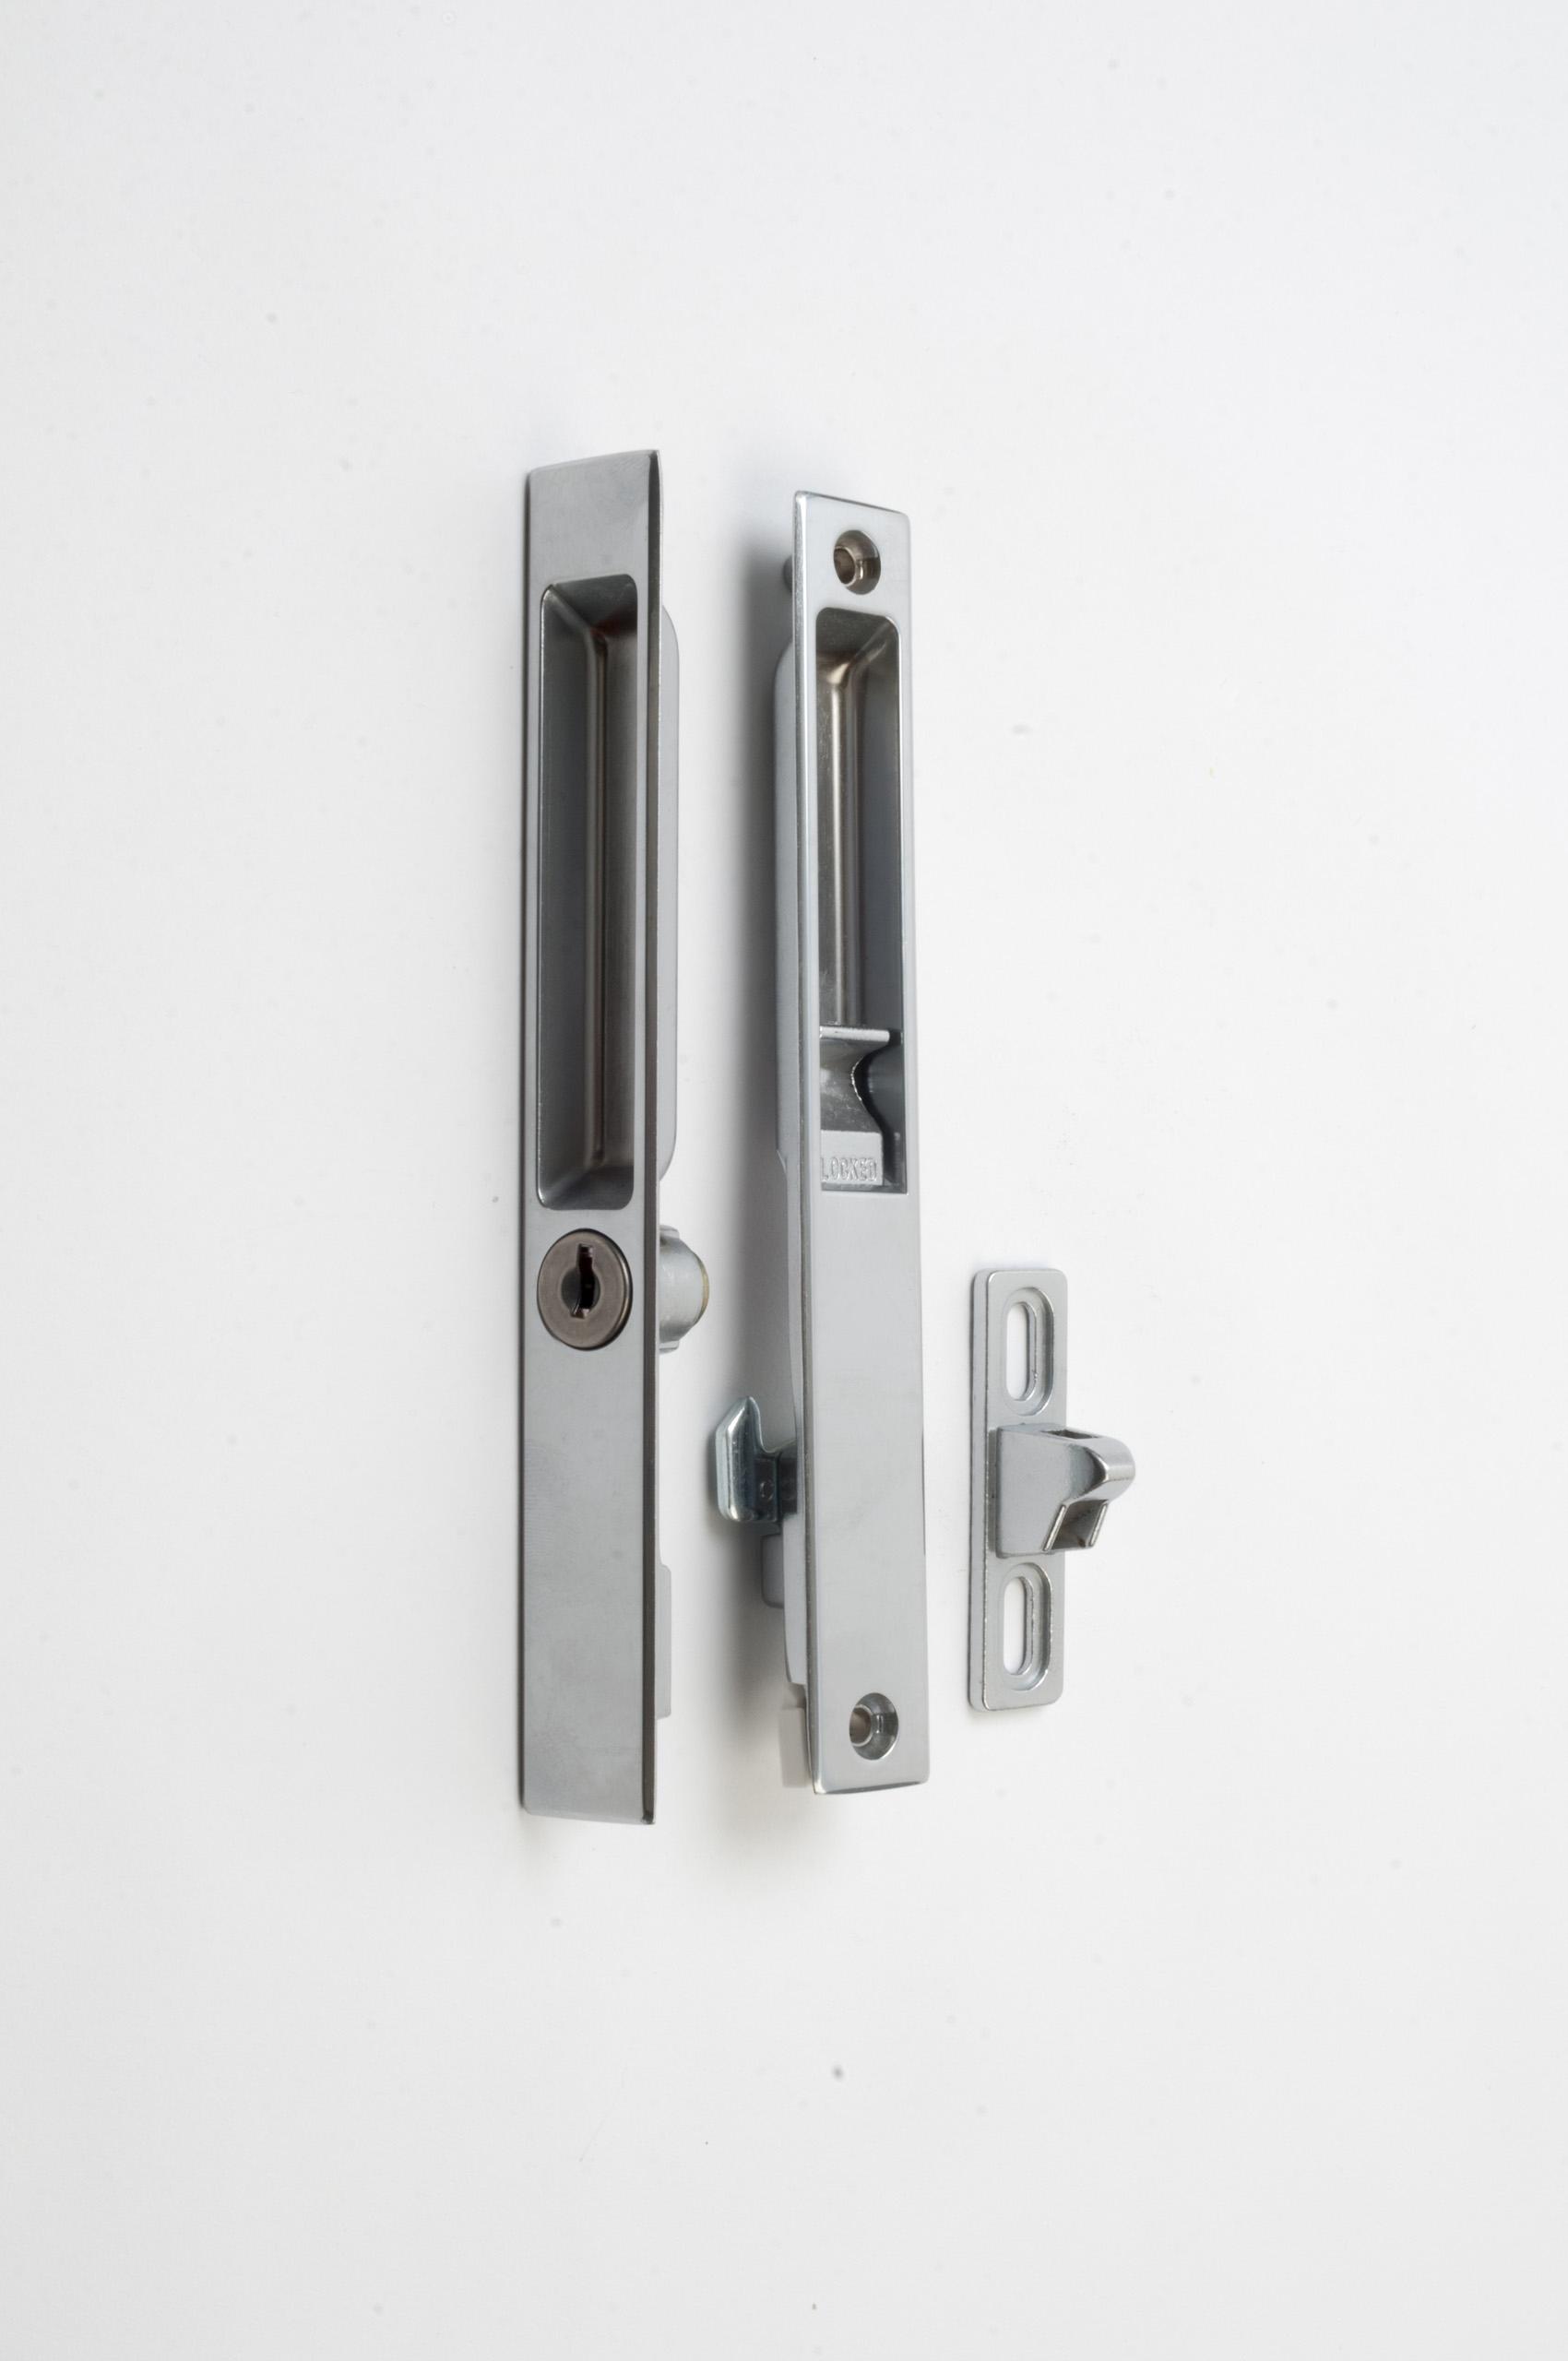 Wooden Sliding Patio Door Lockssliding door child lock design ideas and decor